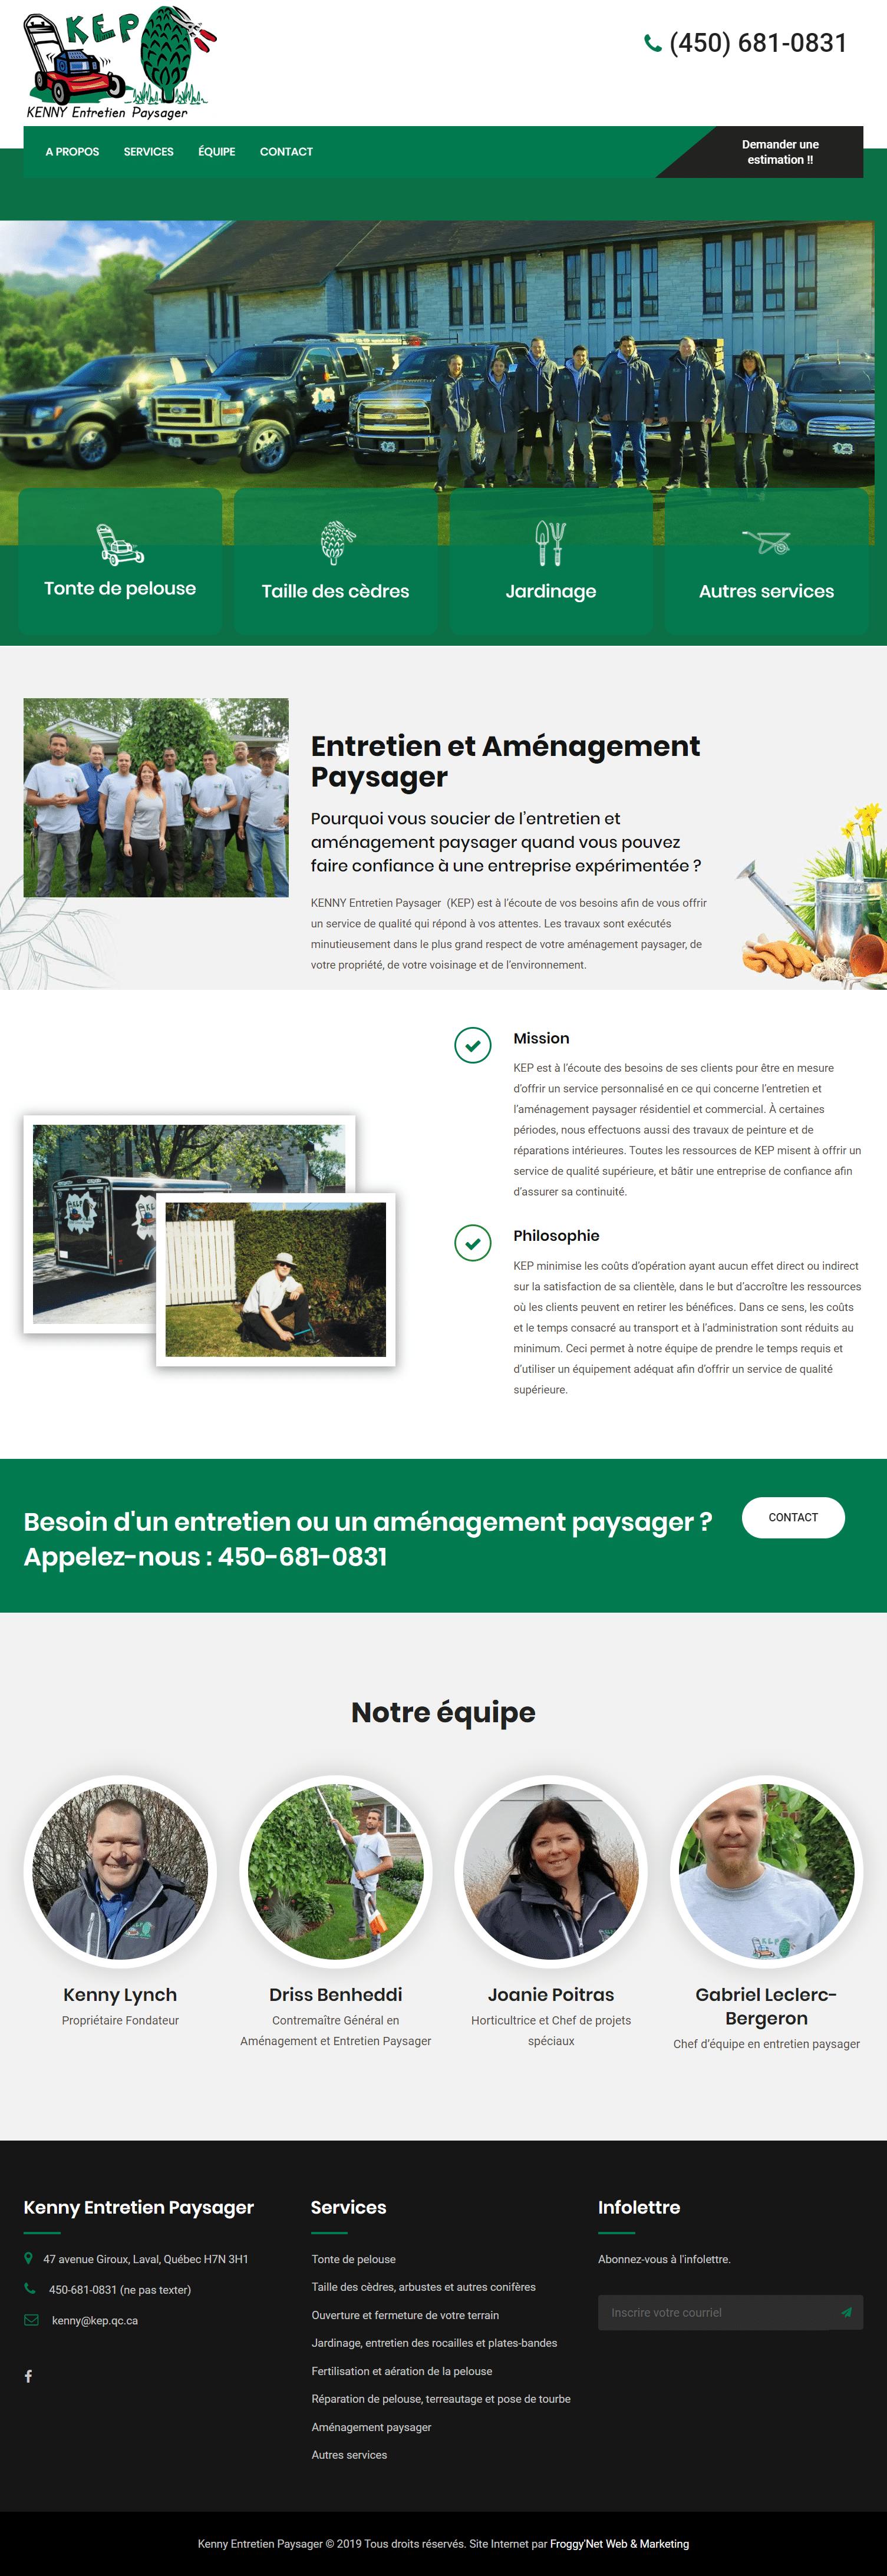 Forfaits création site web 3